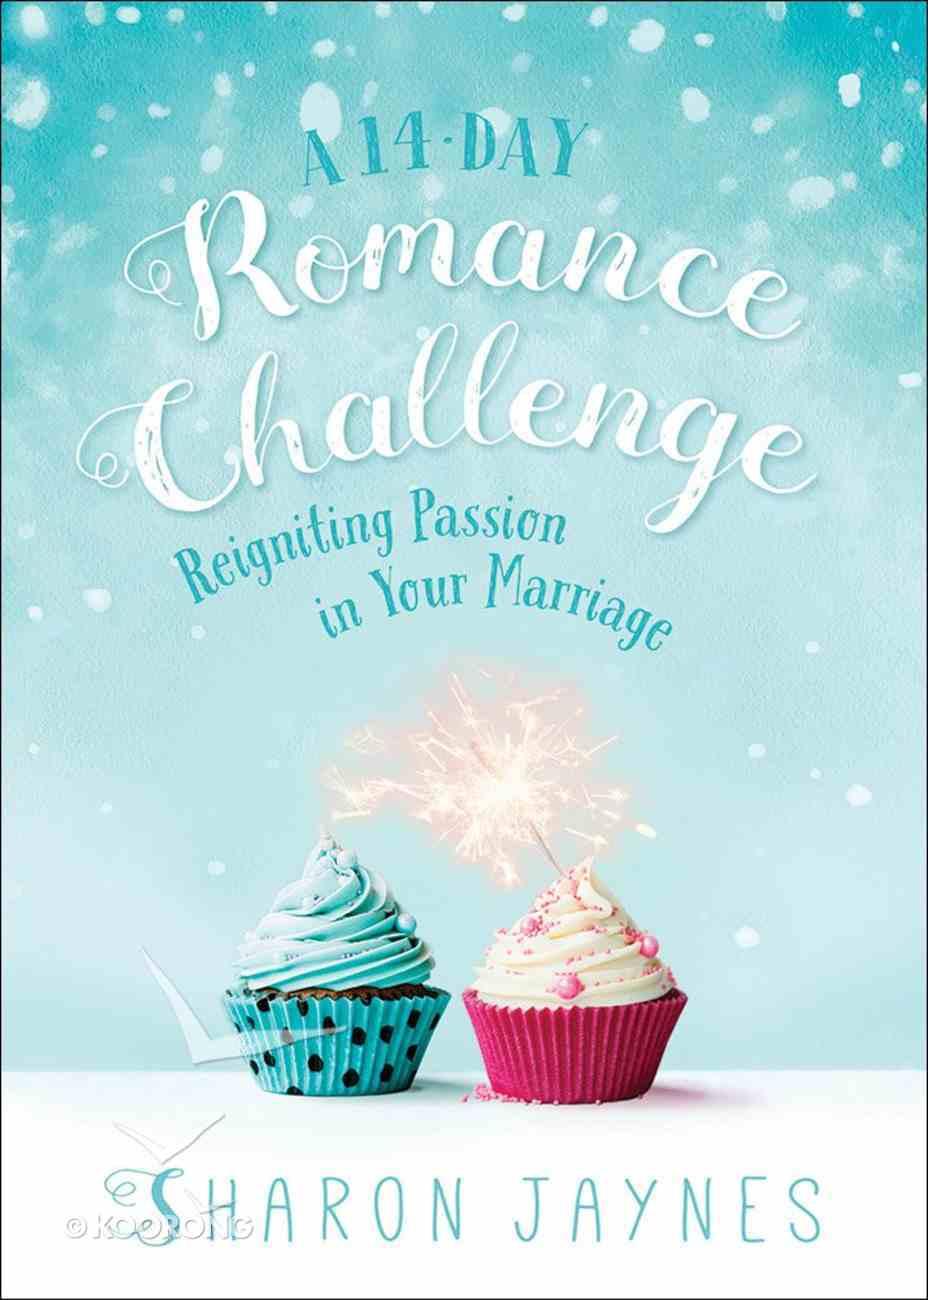 A 14-Day Romance Challenge Paperback